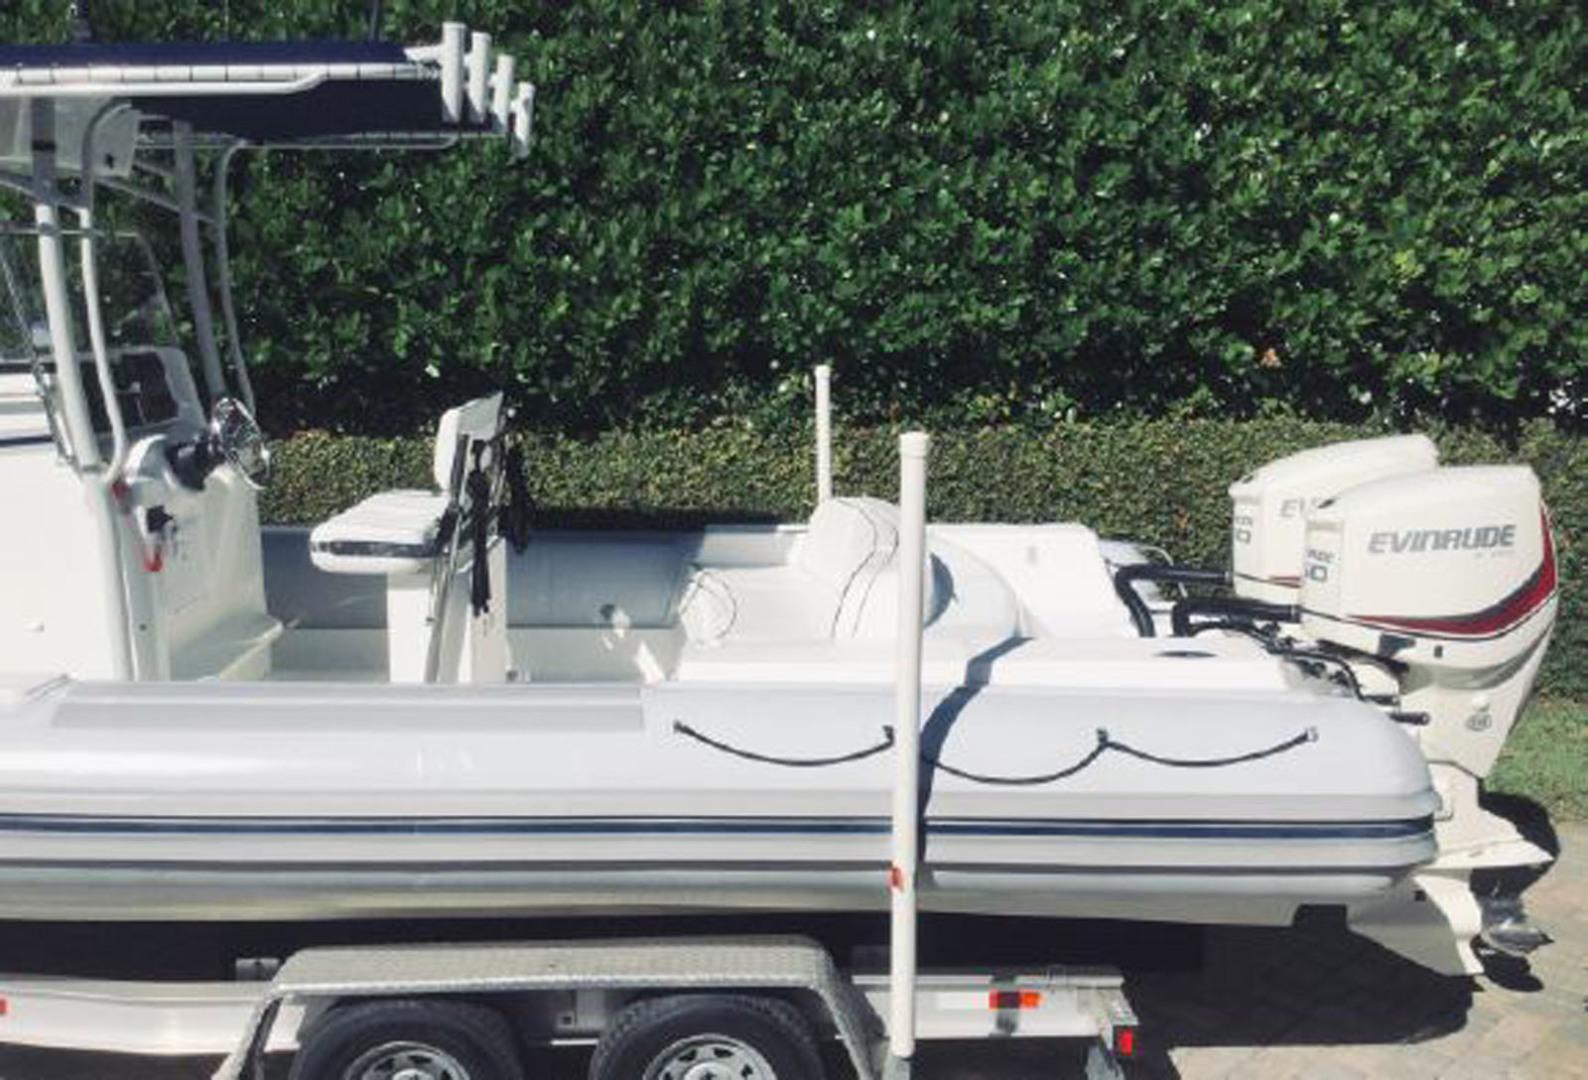 Flexboat-SR760LL 2014-No Name Boca Raton-Florida-United States-1555826 | Thumbnail